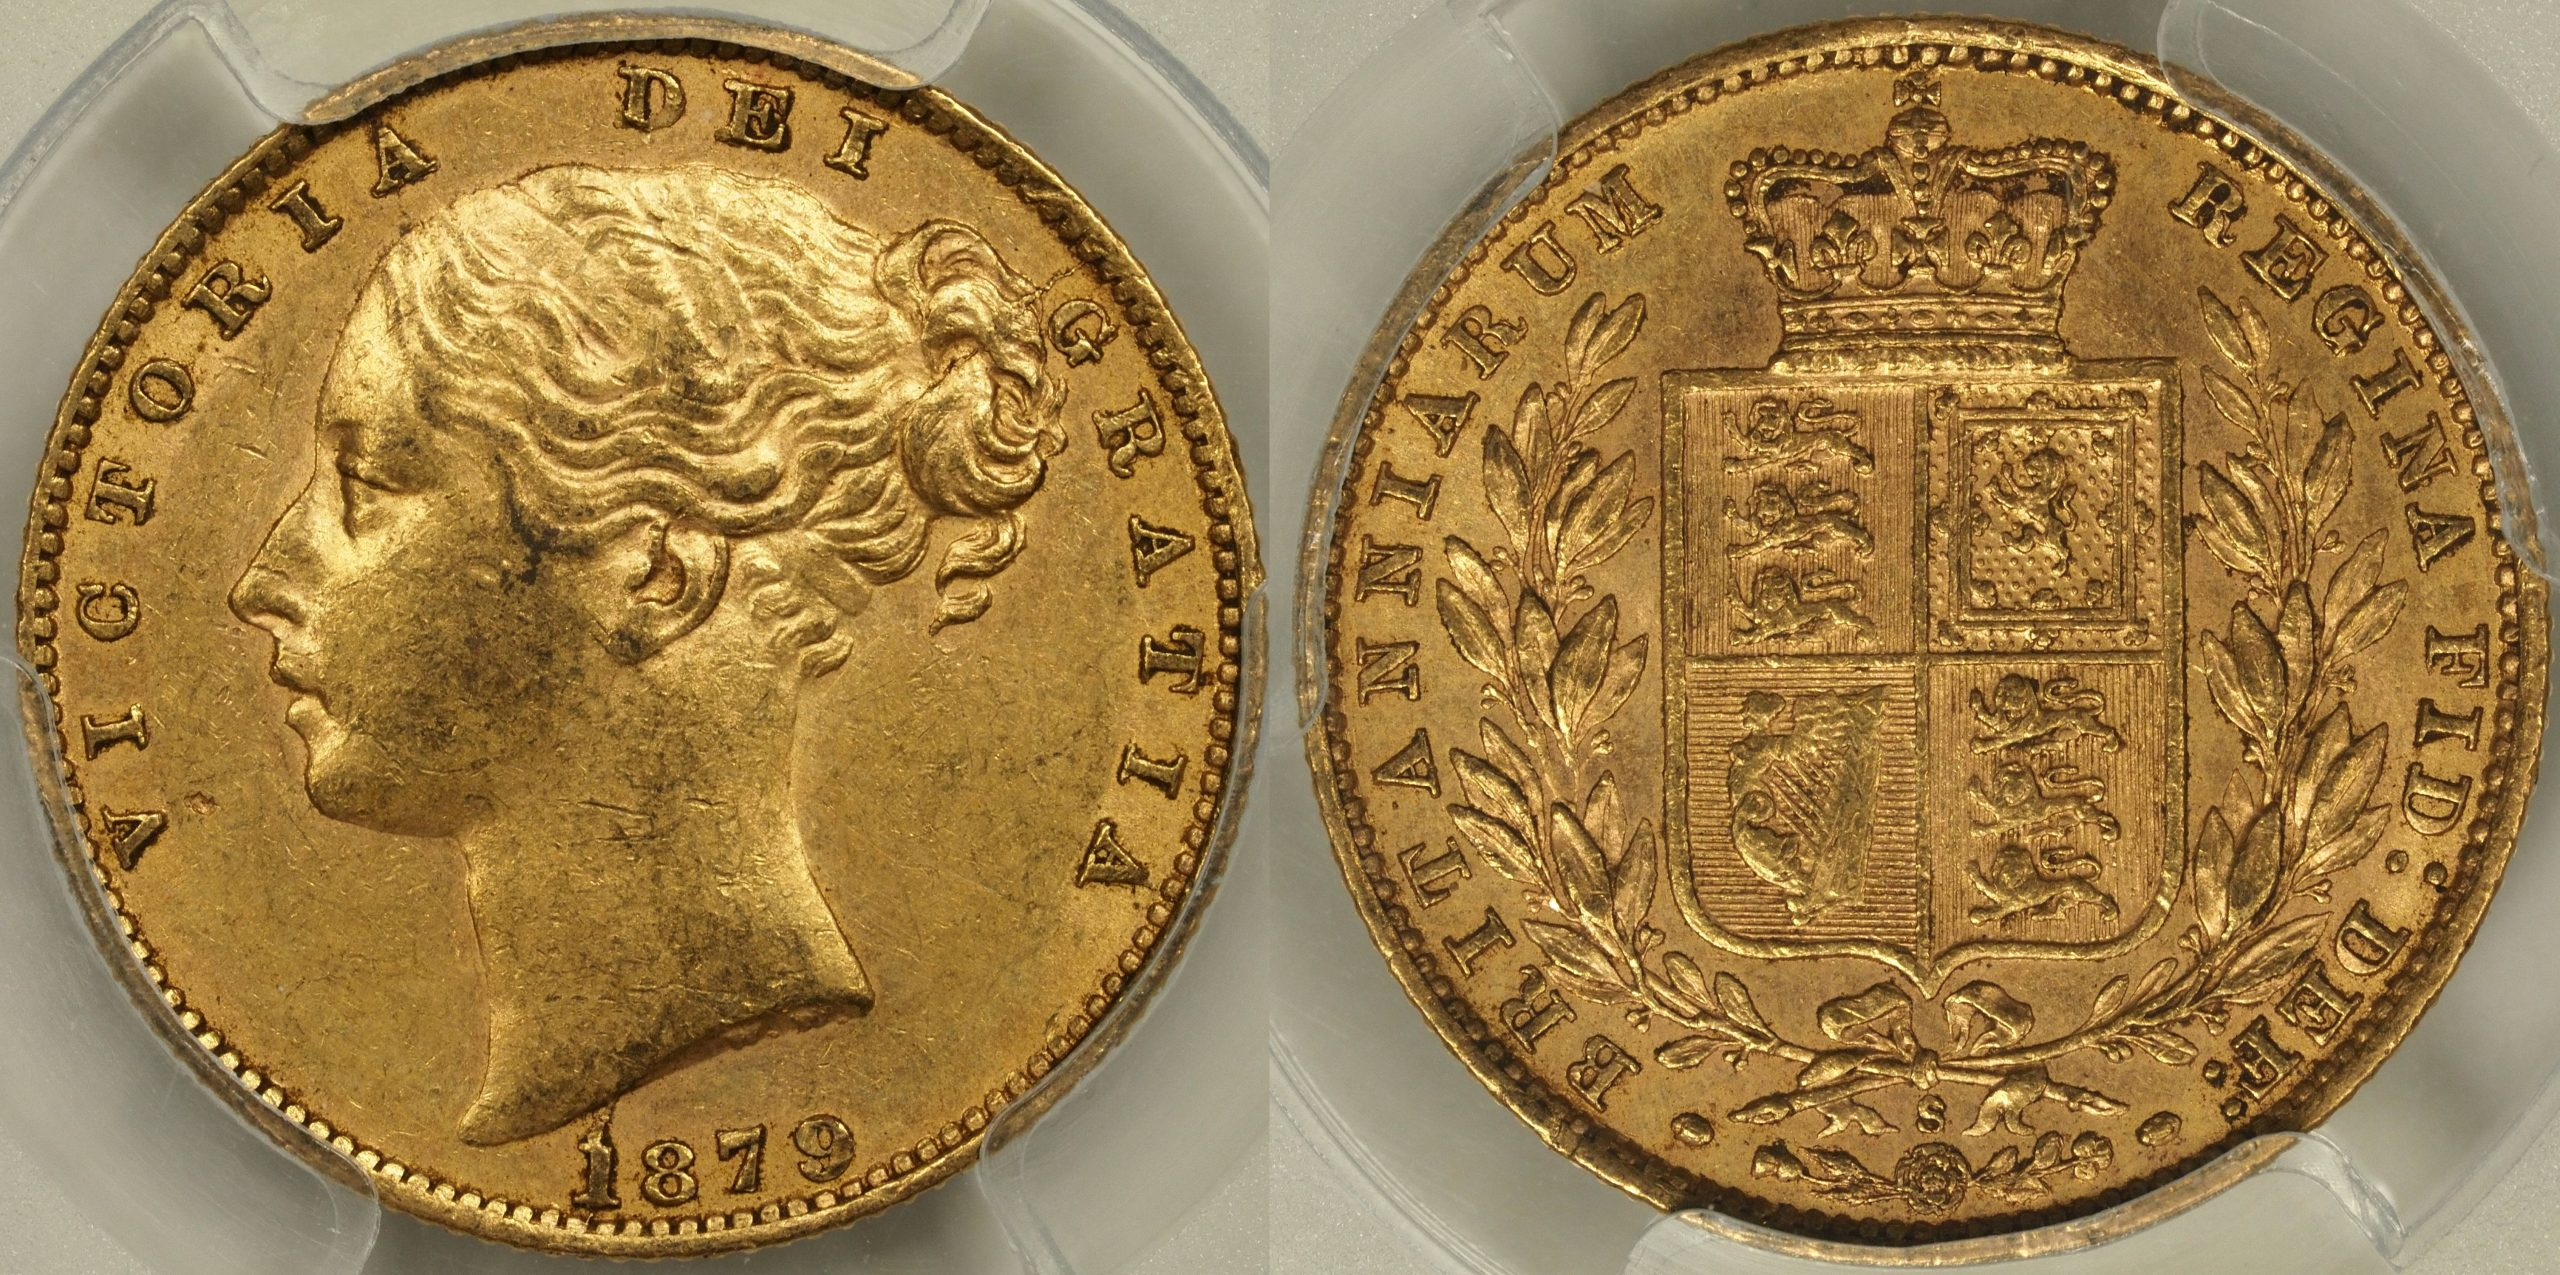 Australia 1879 Sydney Sovereign - PCGS AU58